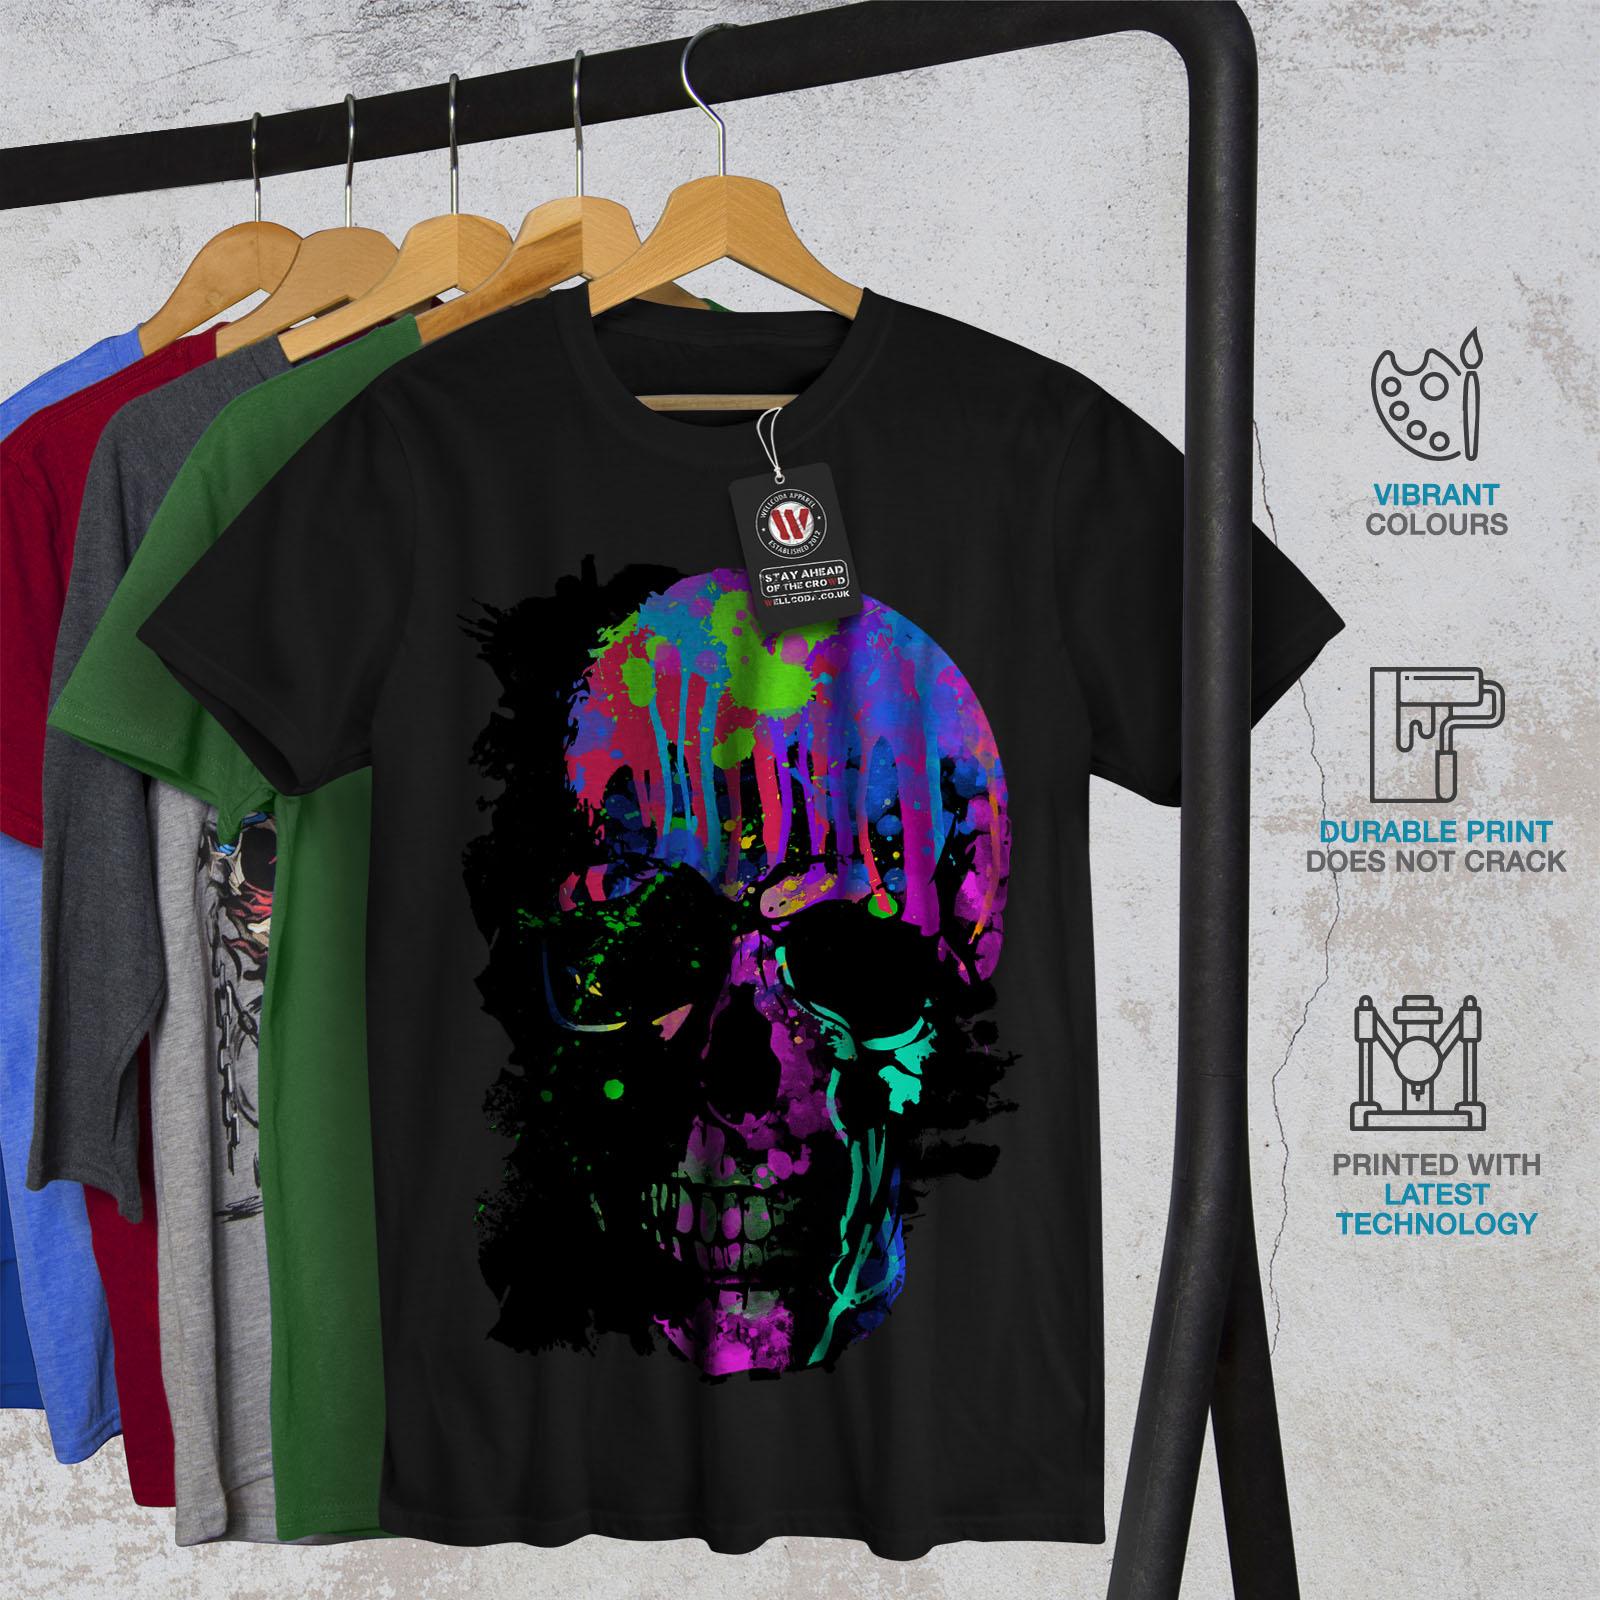 Wellcoda-Skull-Artsy-Mens-T-shirt-Neon-Night-Graphic-Design-Printed-Tee thumbnail 6